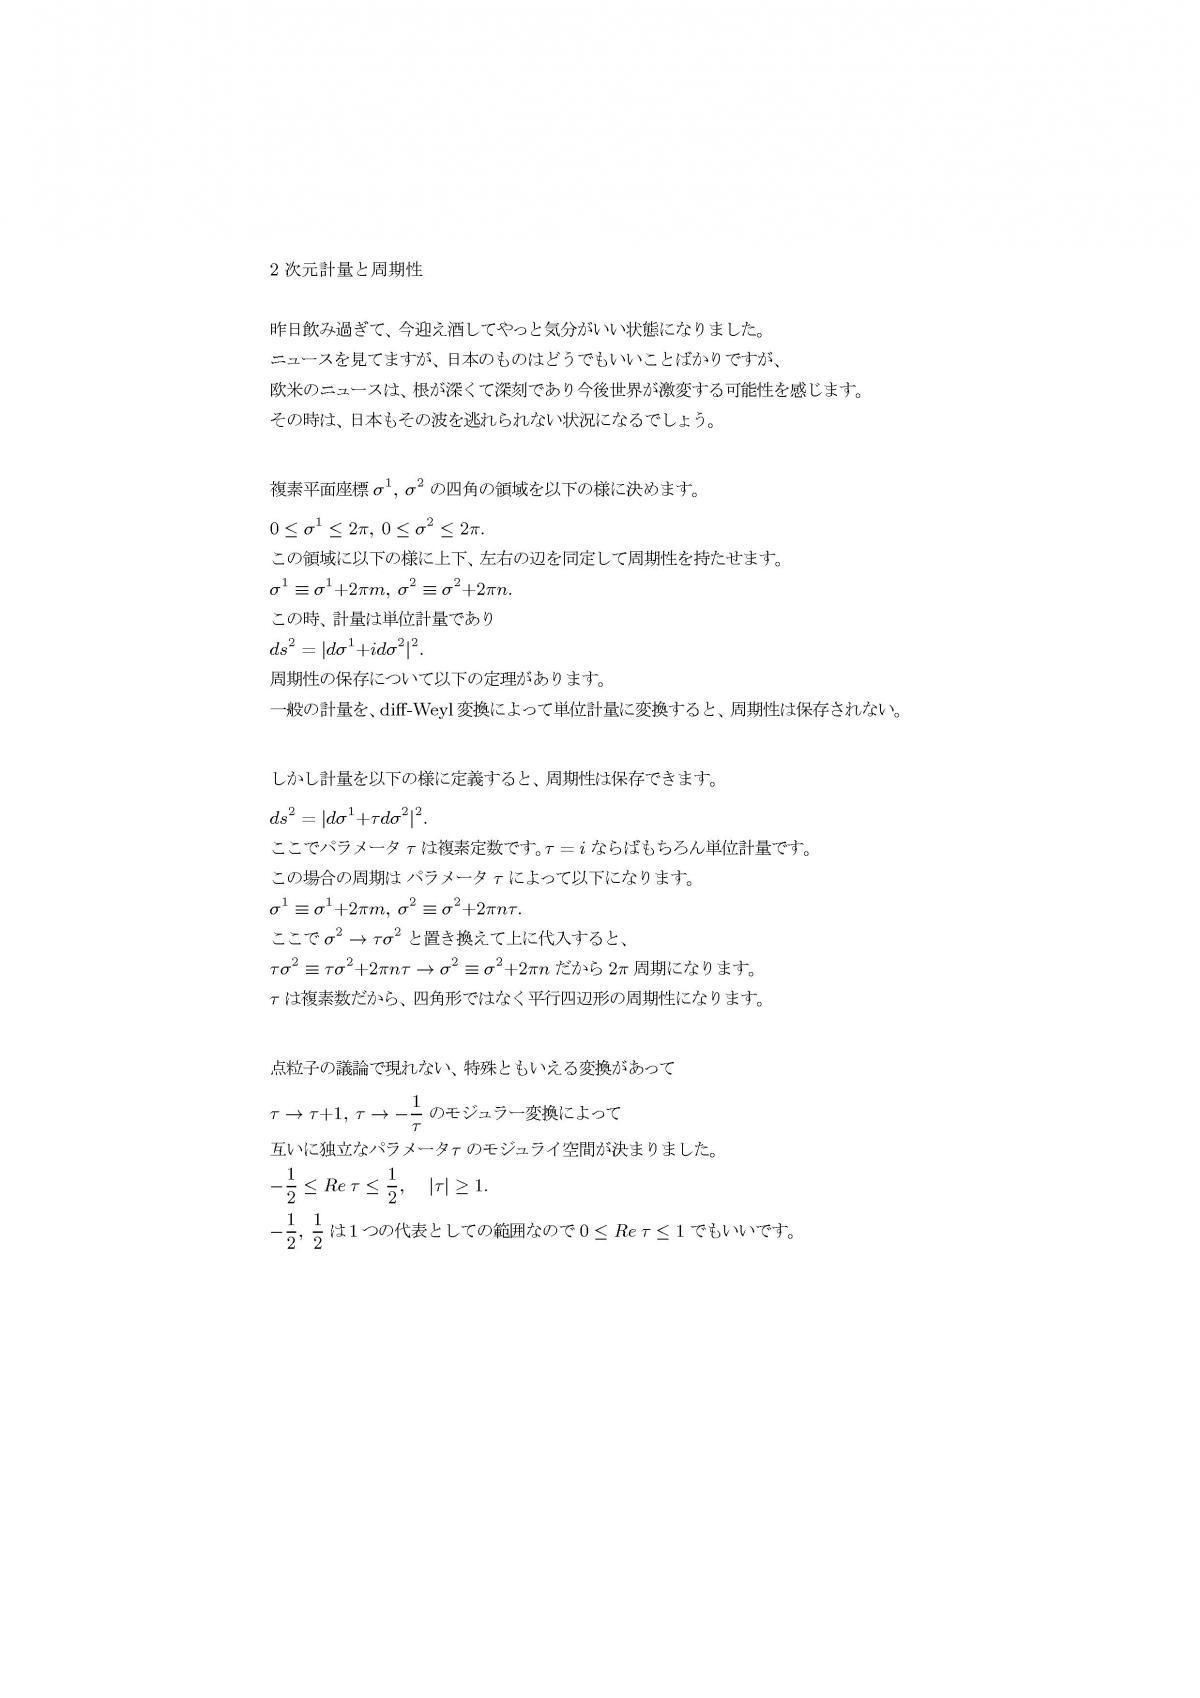 zgen69a.jpg